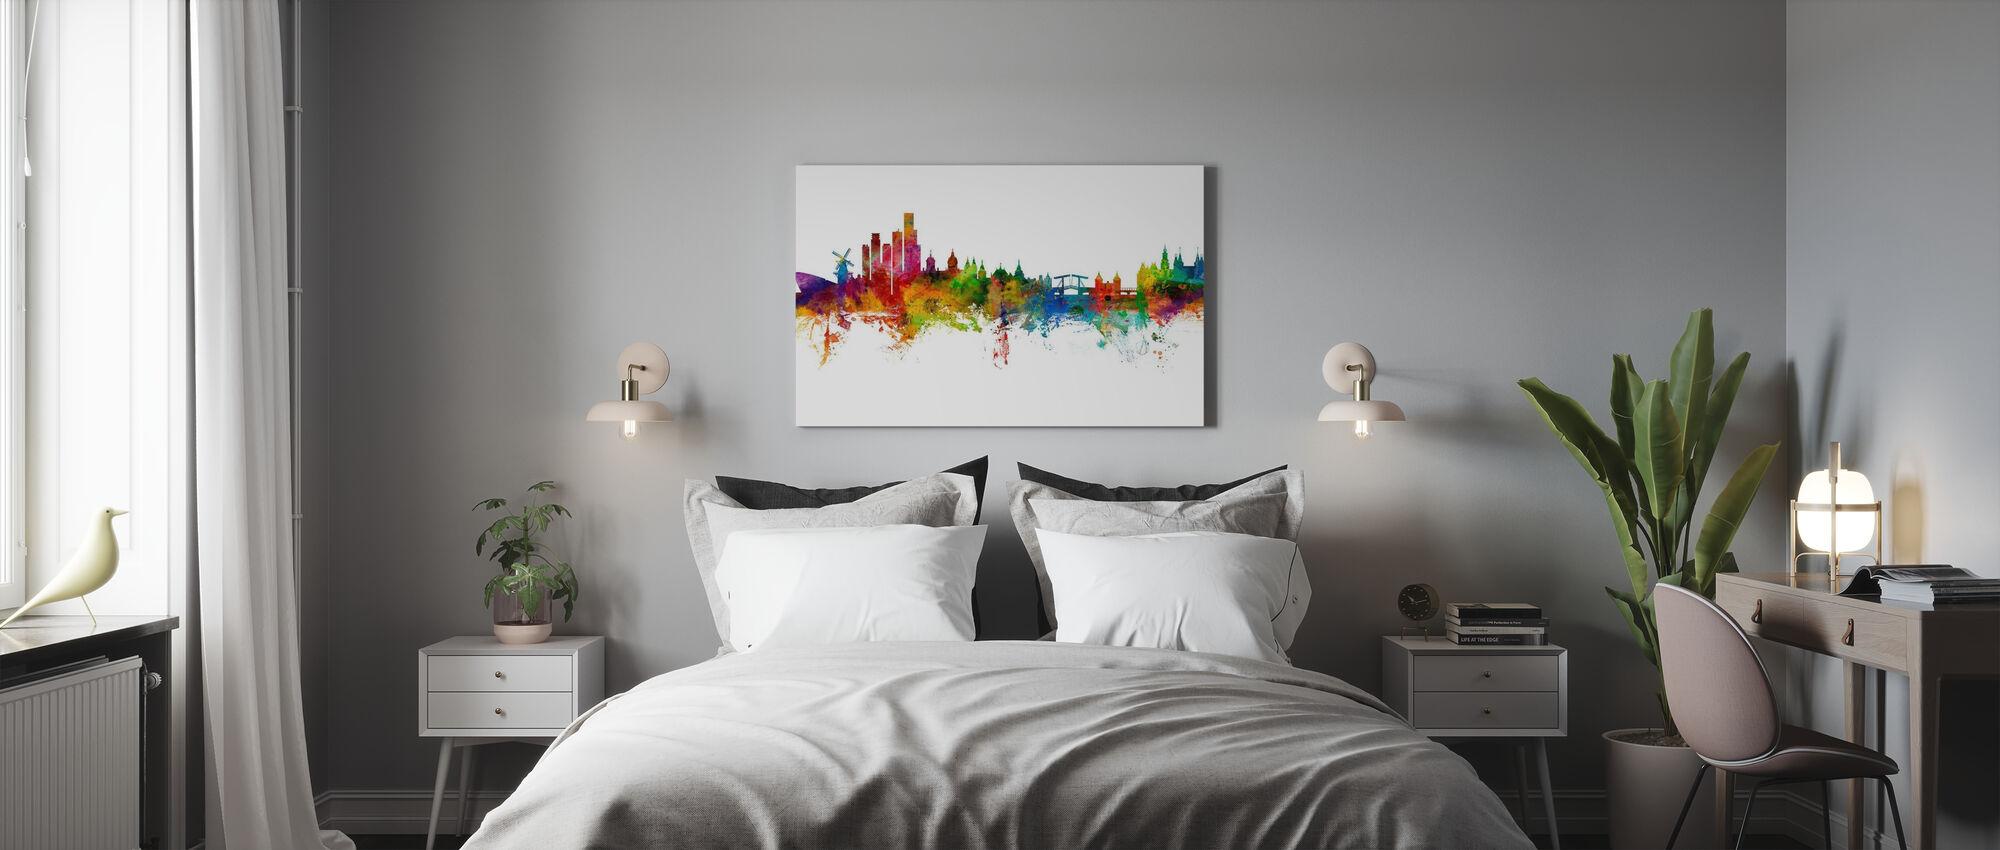 Amsterdam Skyline windmill - Canvas print - Bedroom